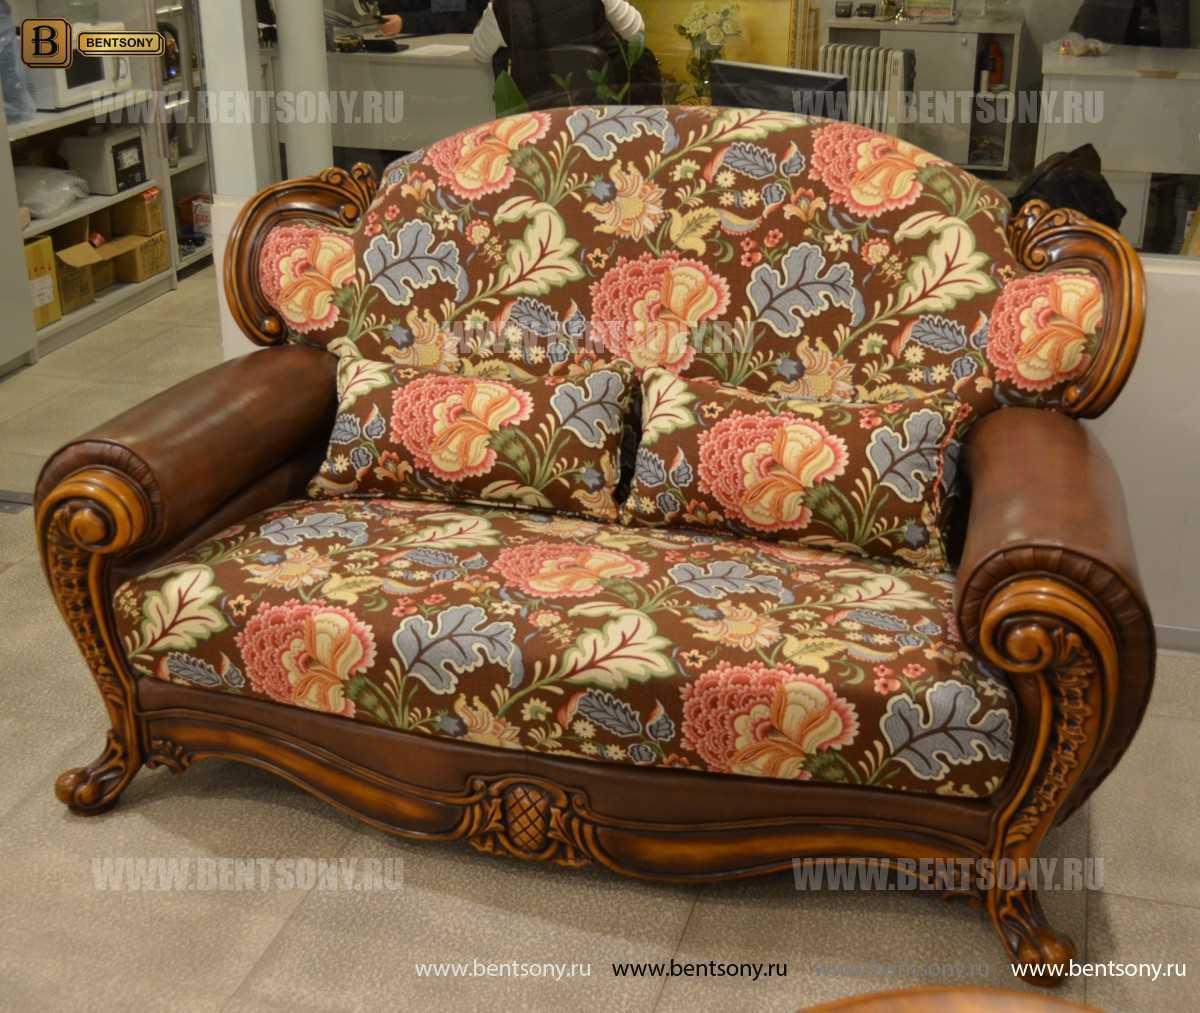 Кресло Дакота D (Классика) каталог мебели